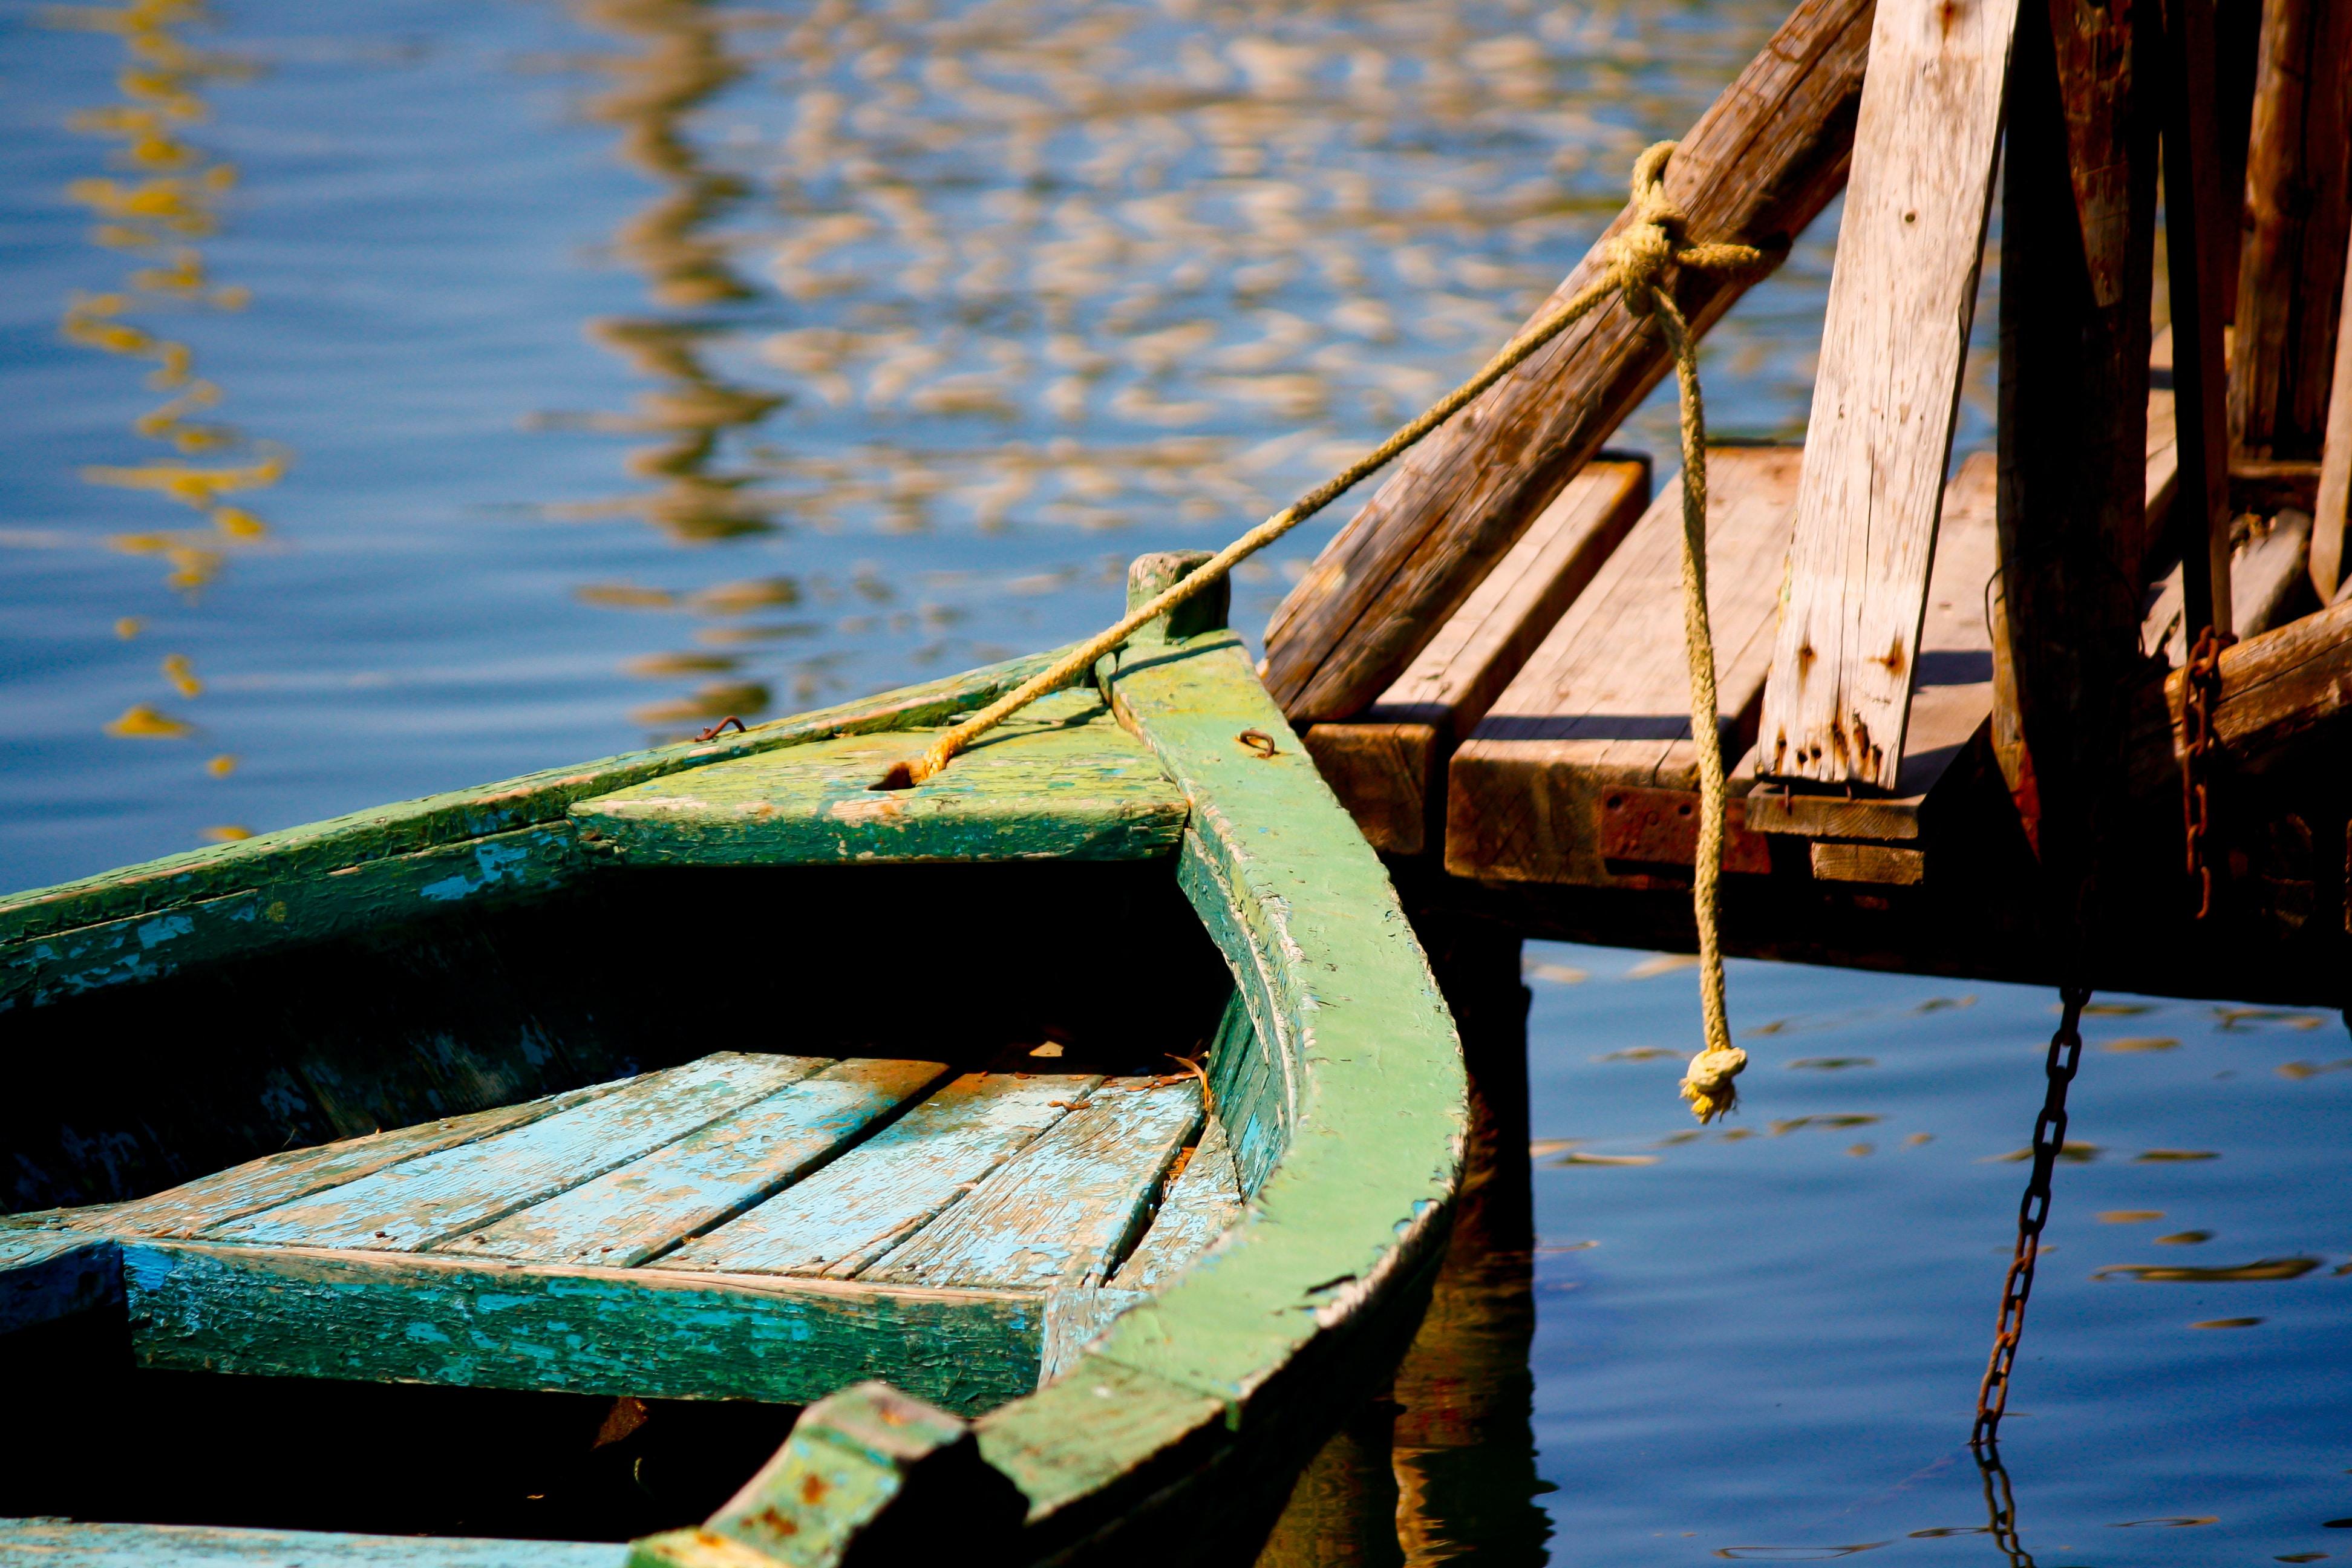 green wooden boat beside the docking pier